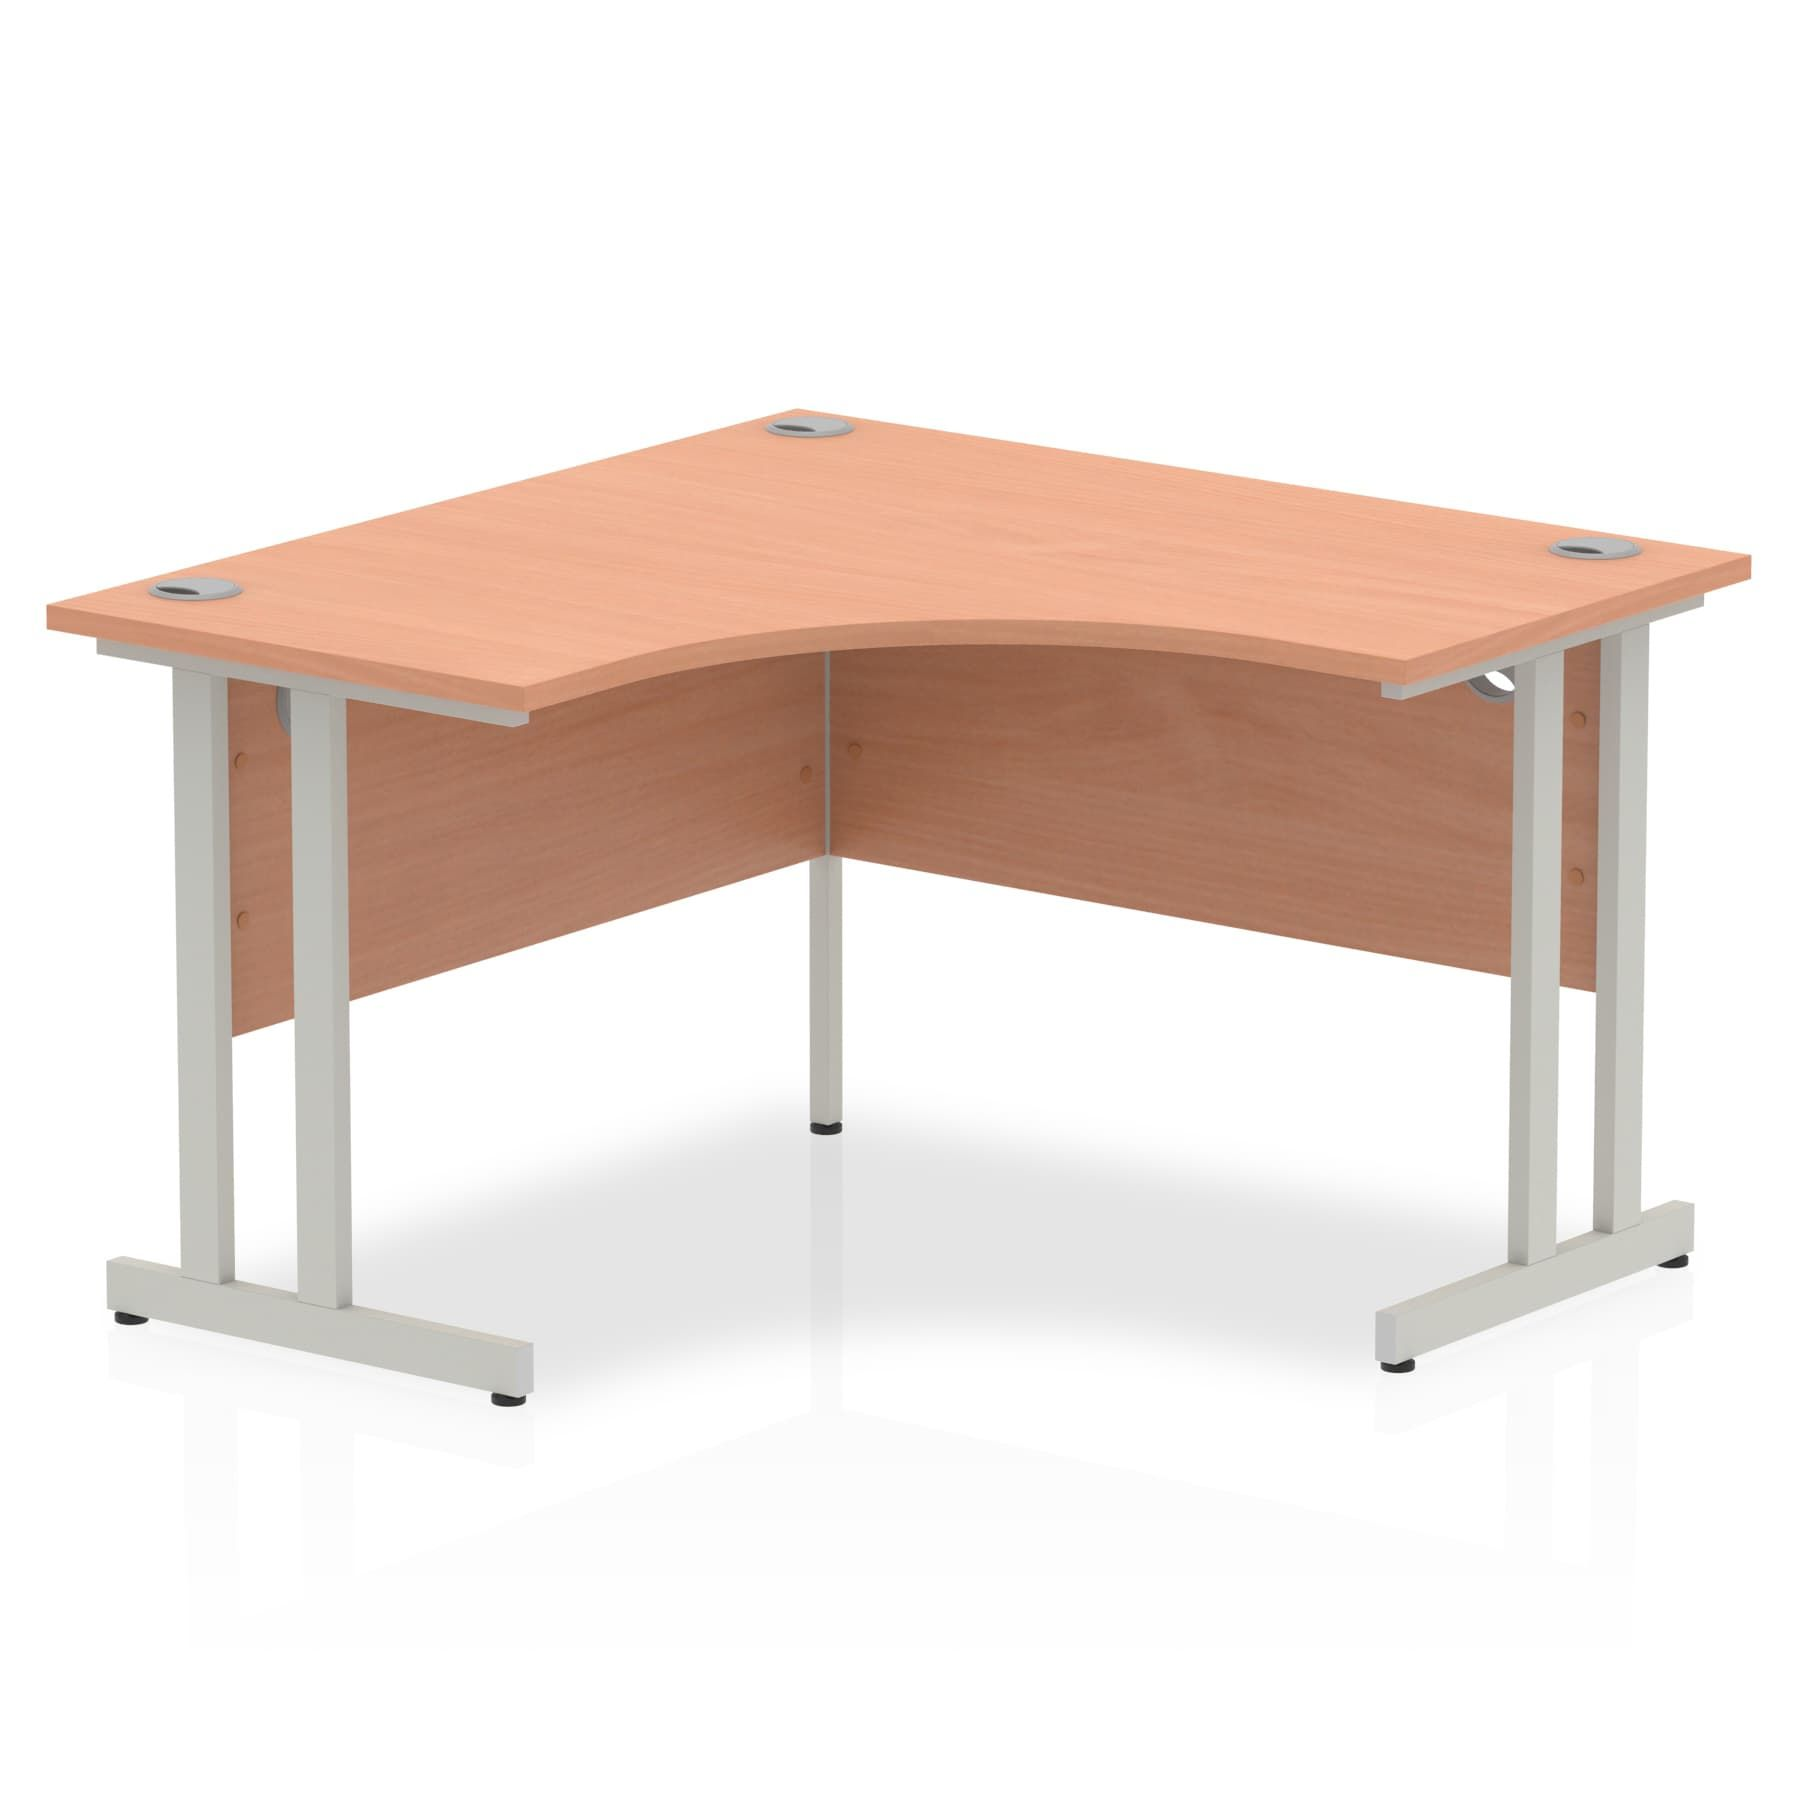 Impulse 1200 Corner Desk with Cantilever Leg